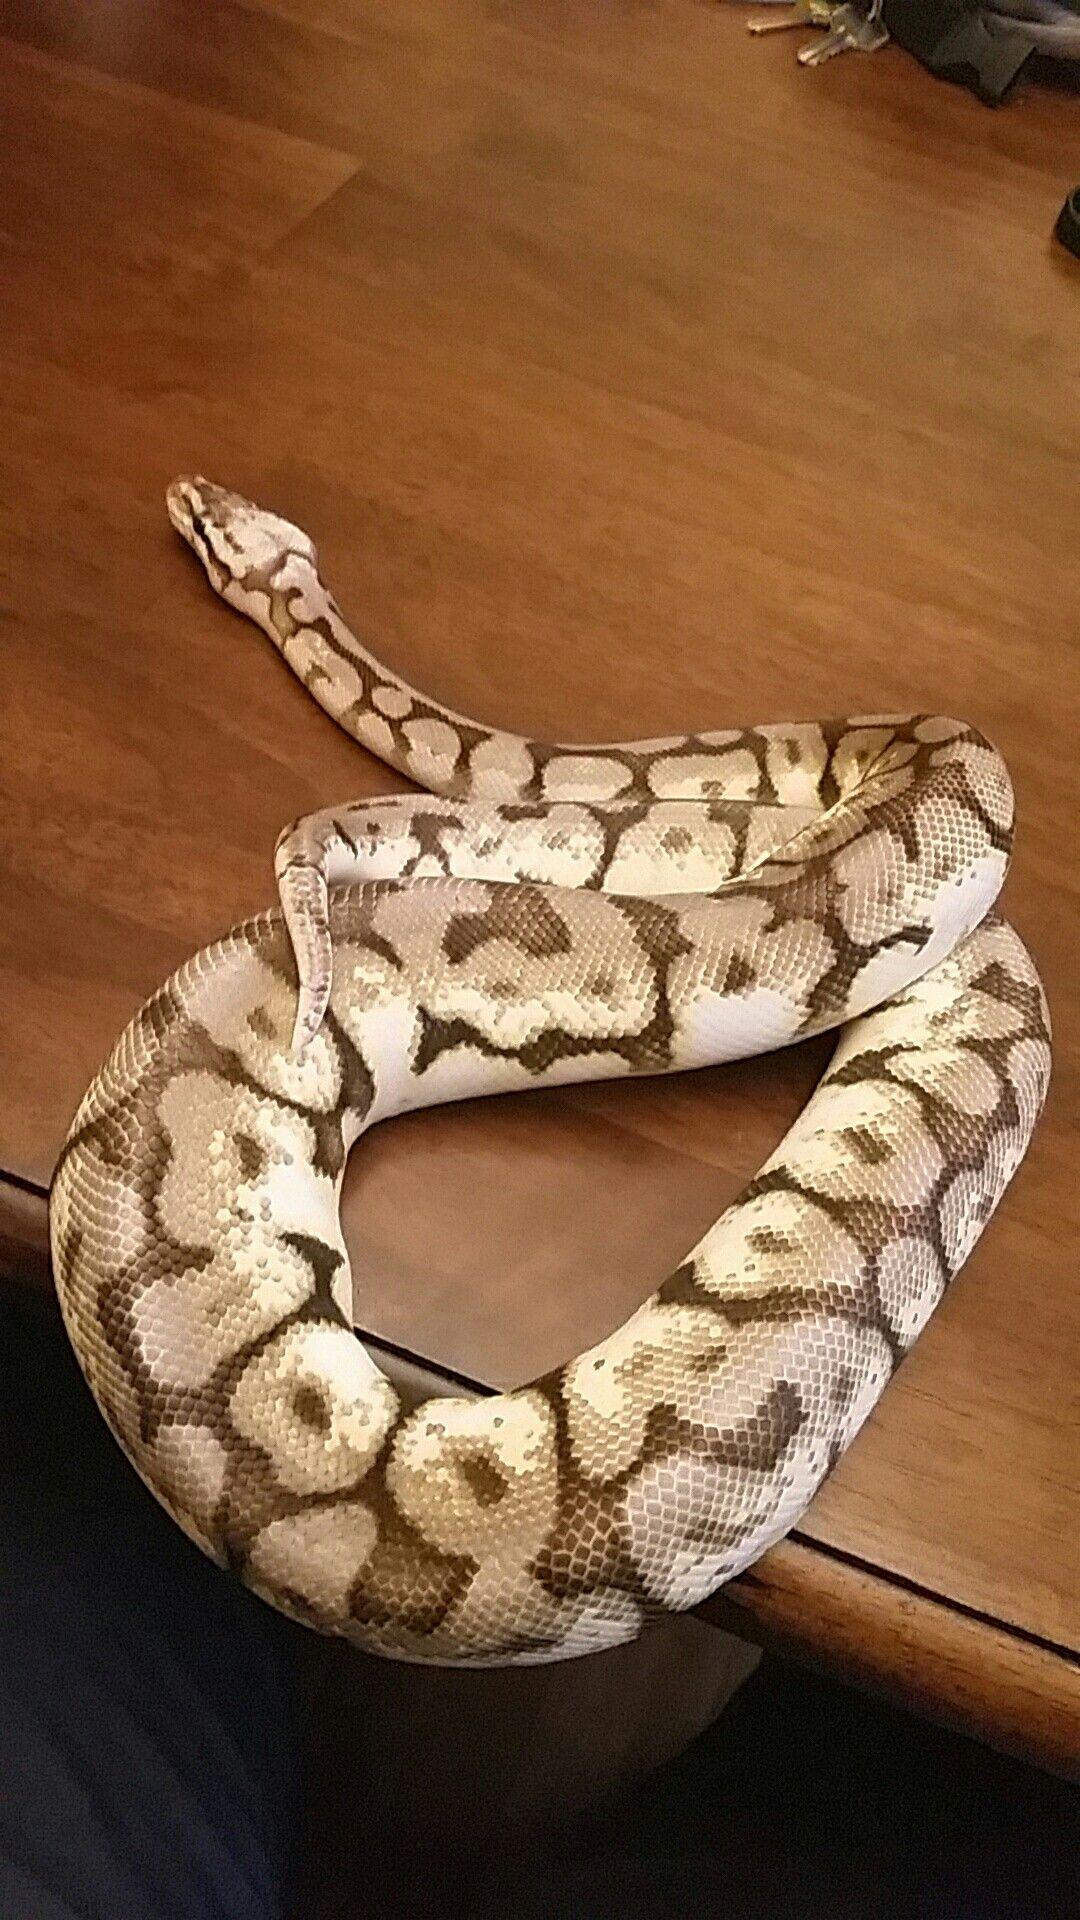 Princess my 1 year old ball python | Pet snake Pretty ...